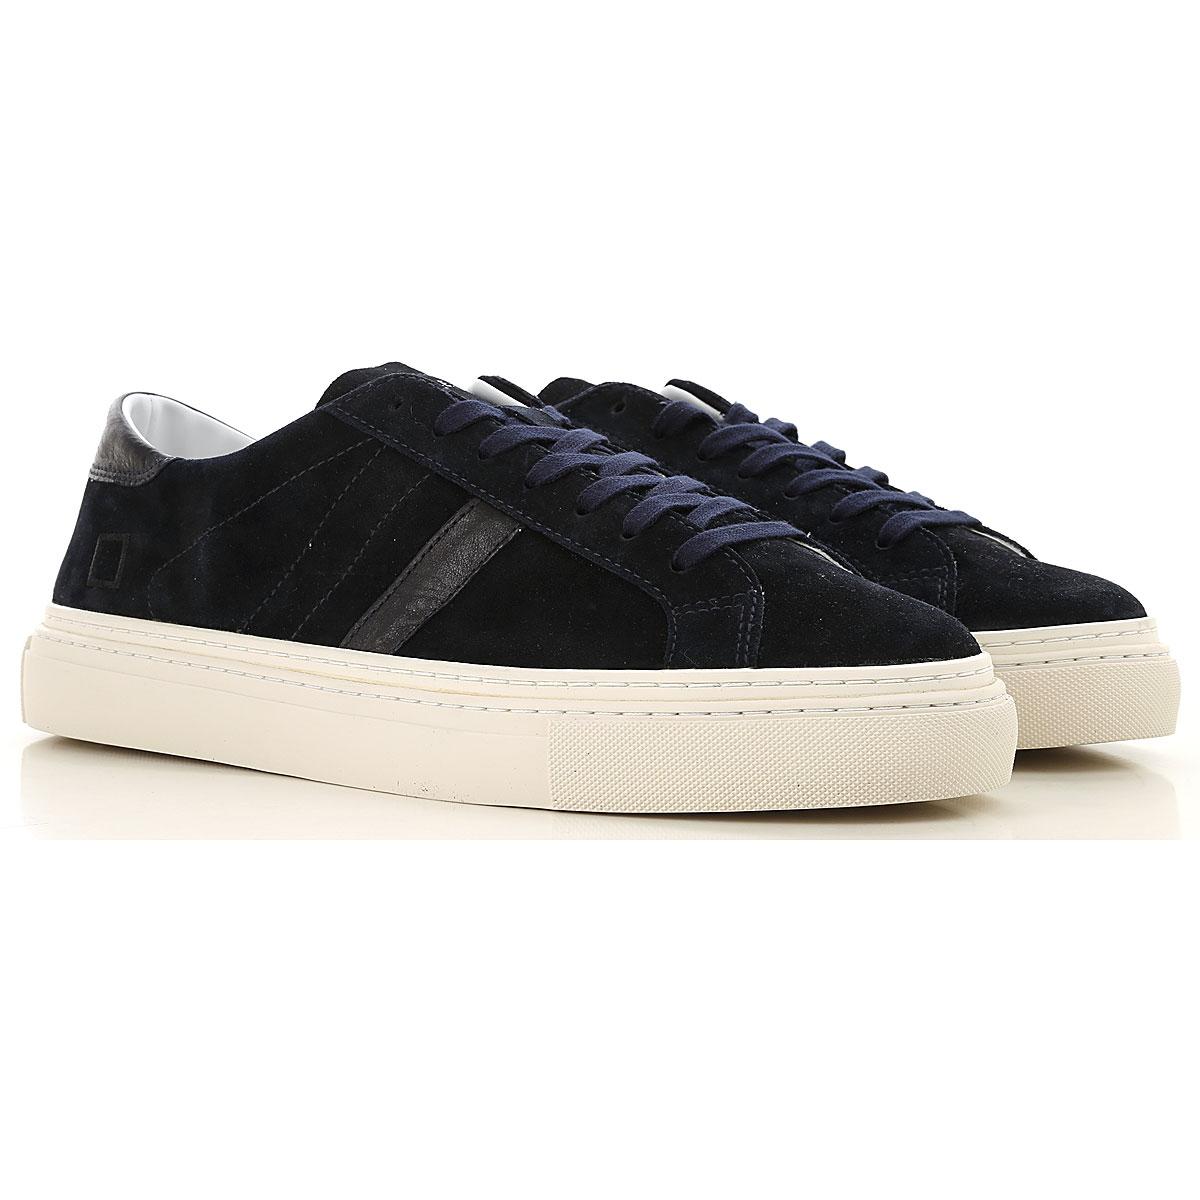 Image of D.A.T.E. Sneakers for Men, Blue, suede, 2017, US 7 - EU 40 - UK 6 - JP 26 US 8 - EU 41 - UK 7 - JP 26.5 US 9 - EU 42 - UK 8 - JP 27 US 10 - EU 43 - UK 9 - JP 27.5 US 11 - EU 44 - UK 10 - JP 28